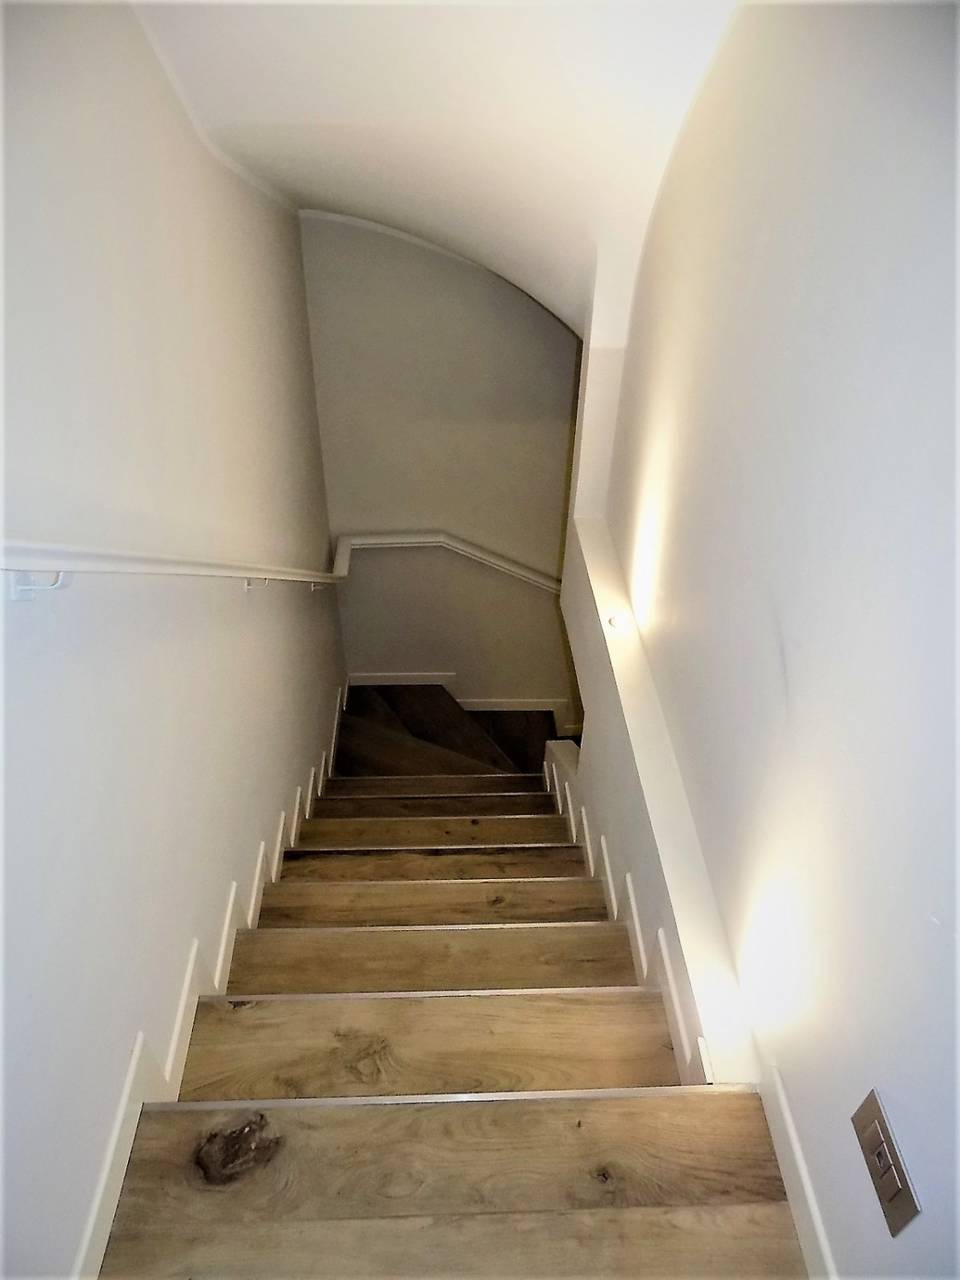 Porzione-villa-bifamigliare-ristrutturata-in-vendita-a-Carnate-22